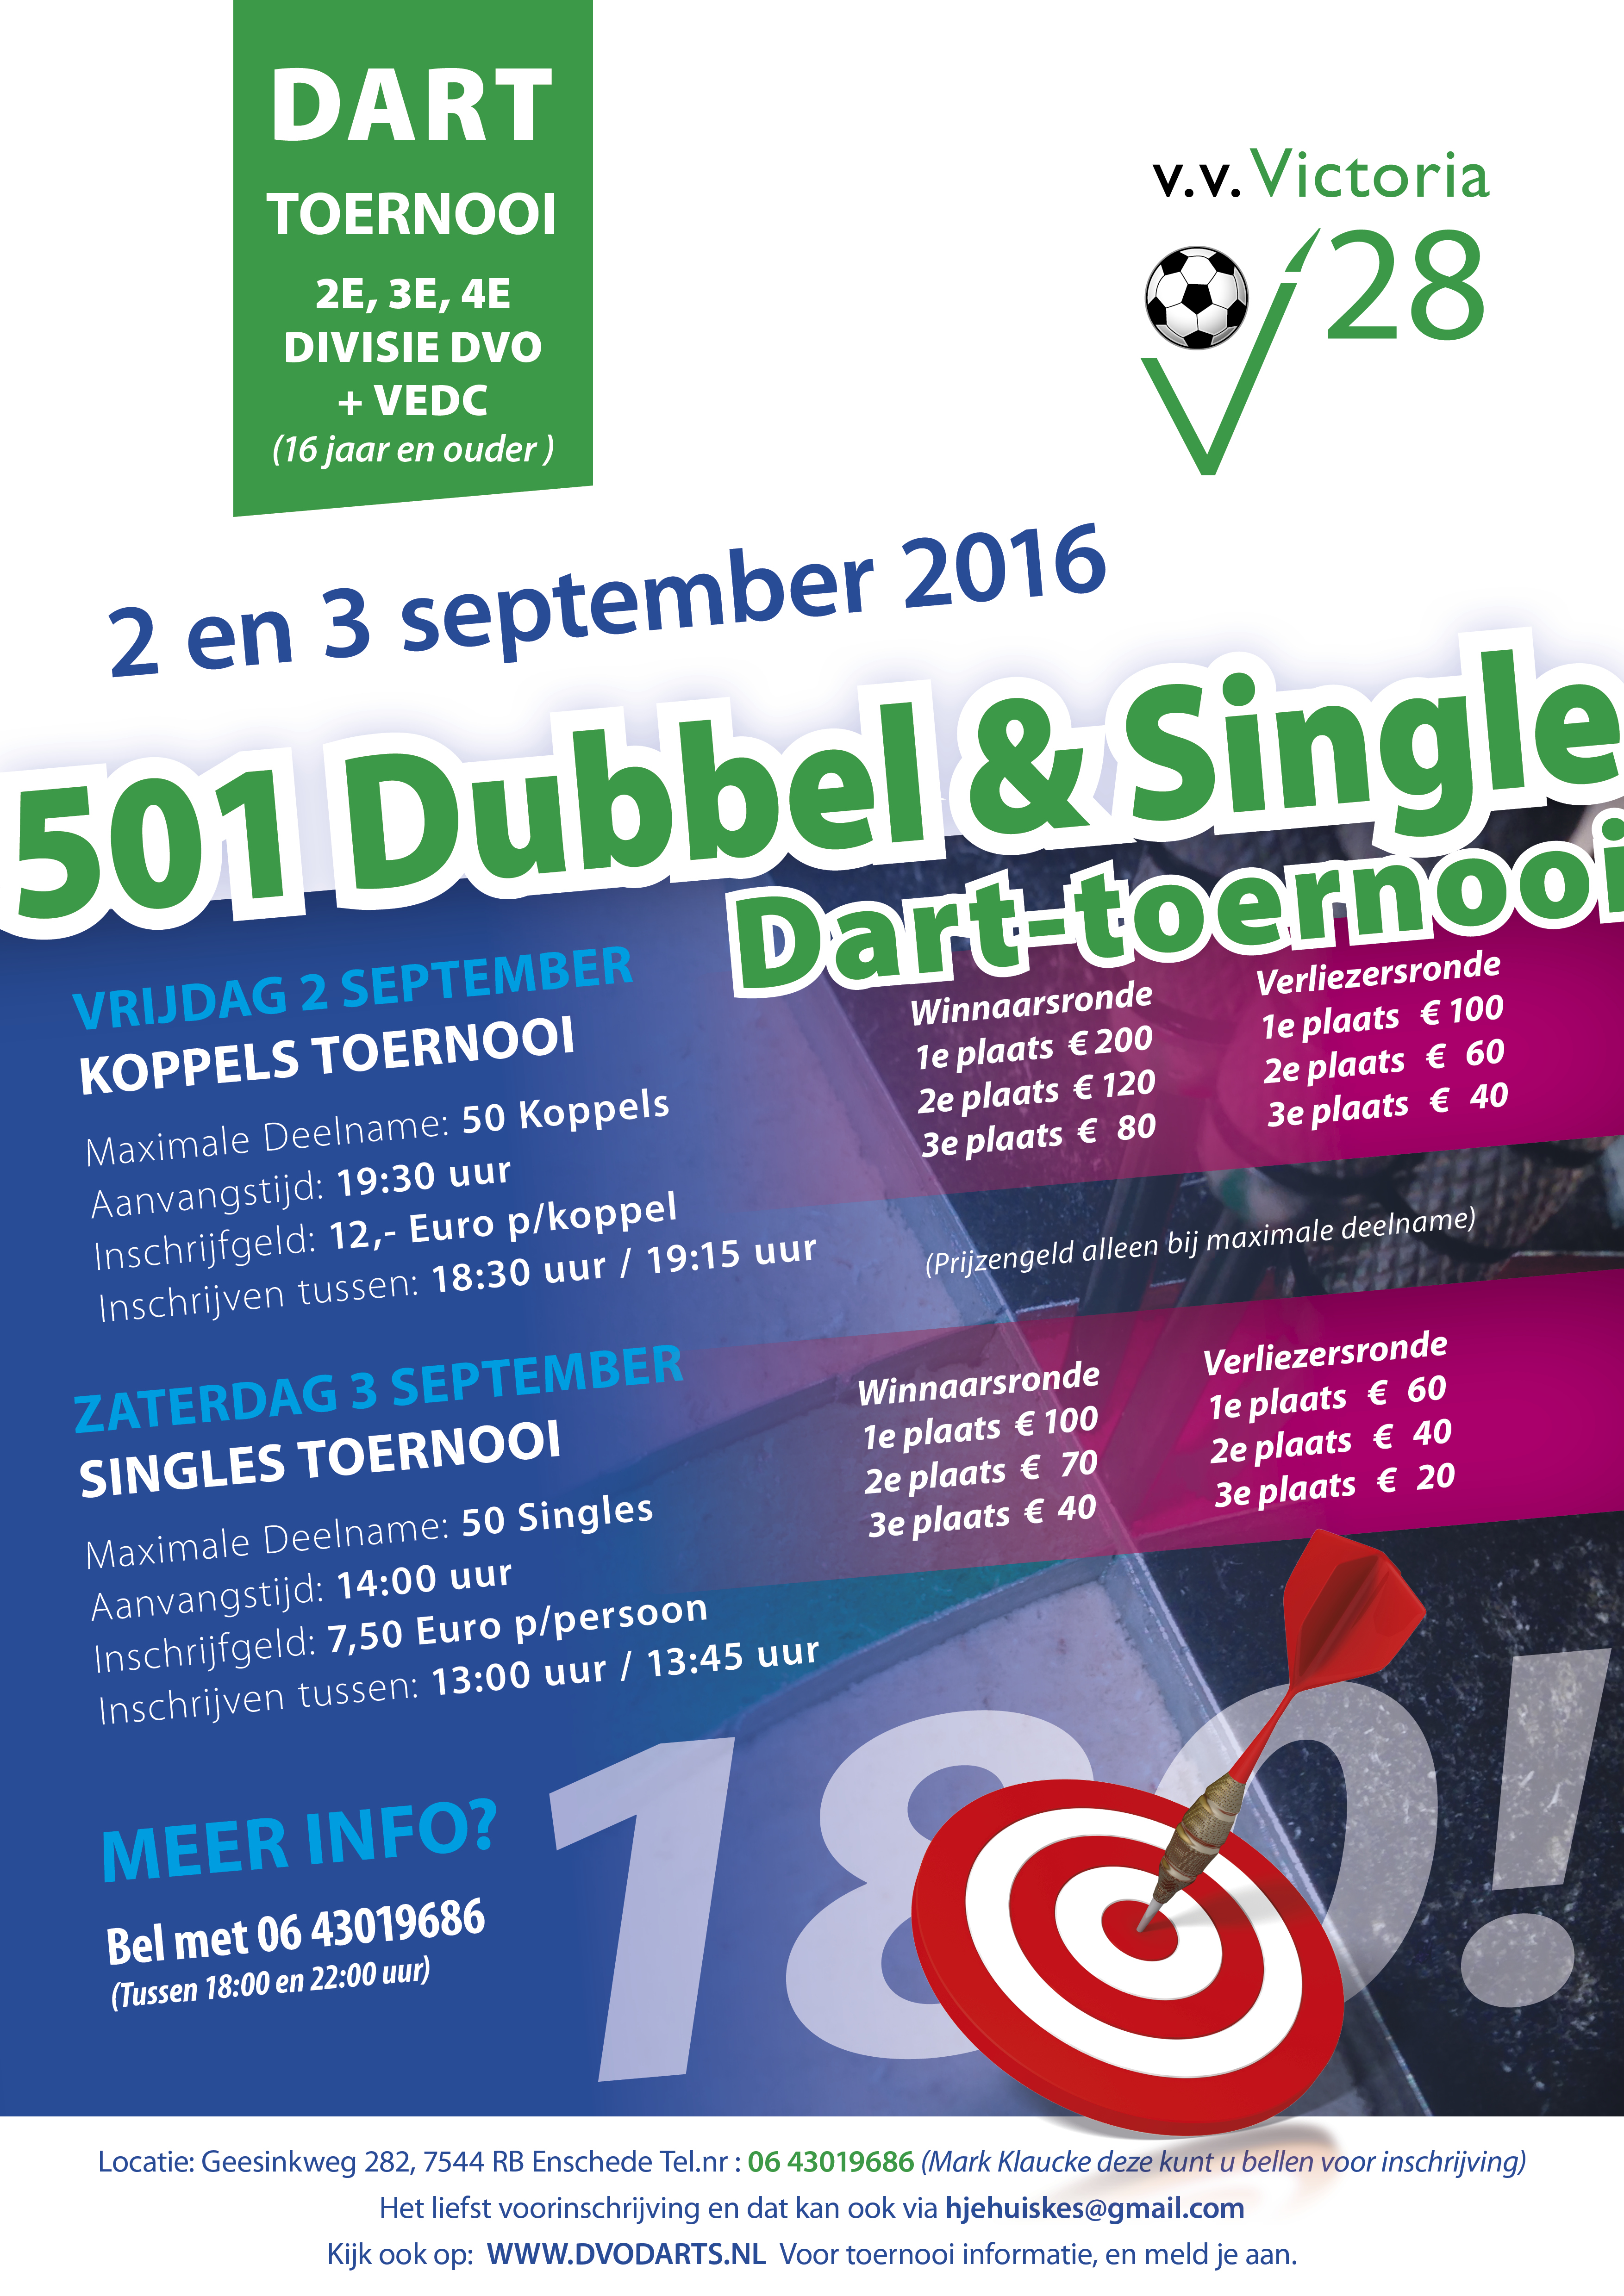 A3 Poster Darttoernooi 2016 kopie